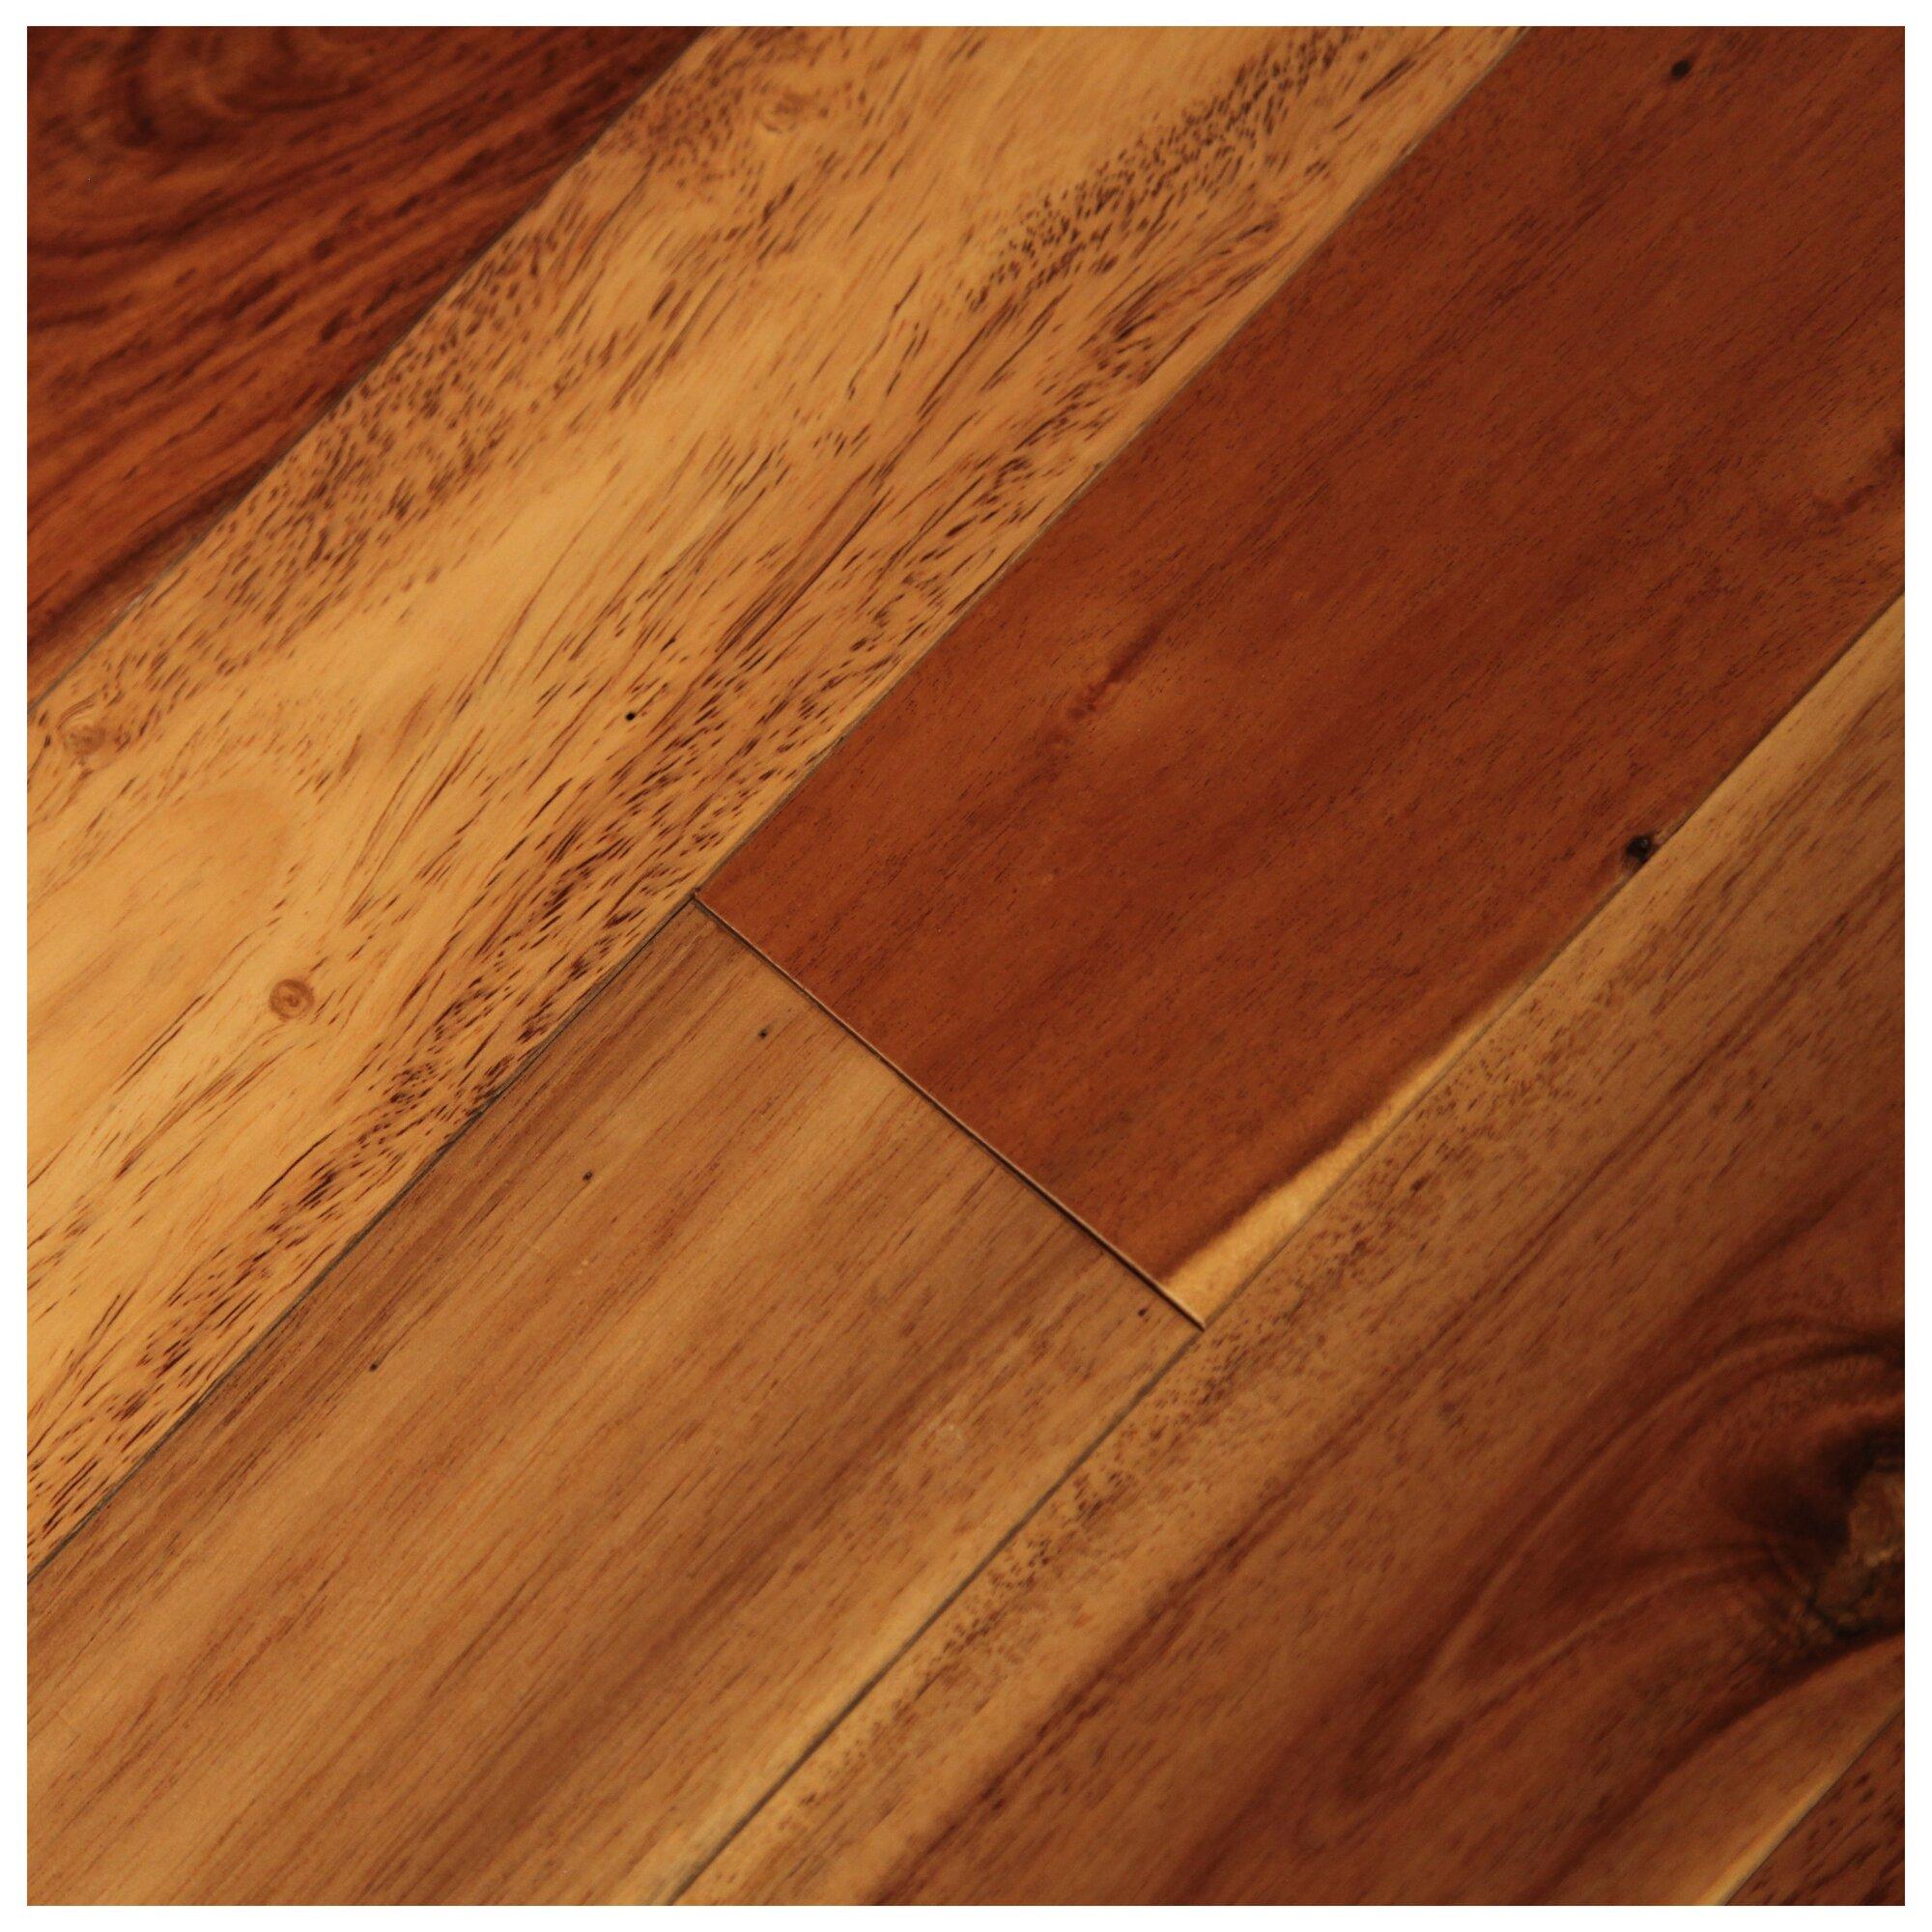 3 4 Hardwood Flooring new hardwood flooring over old hardwood flooring 34 thick or thinner solid or engineered hardwood flooring must be installed across the old wood floor 4 34 Engineered Acacia Hardwood Flooring In Natural